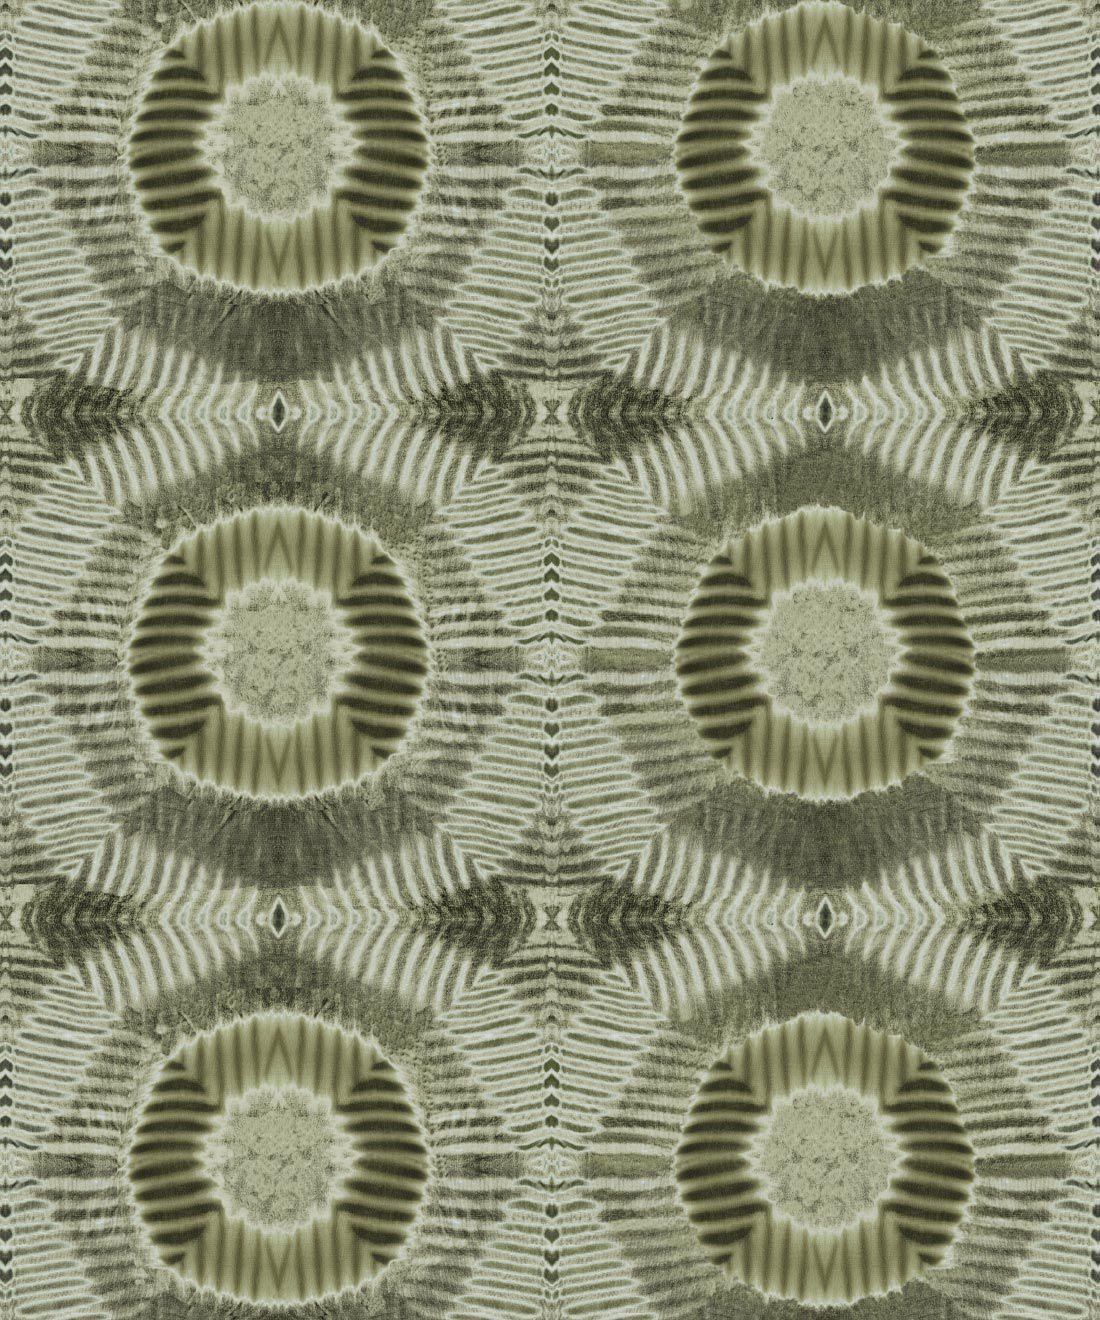 Aztec Suns Wallpaper Olive • Shibori Geometric • Swatch